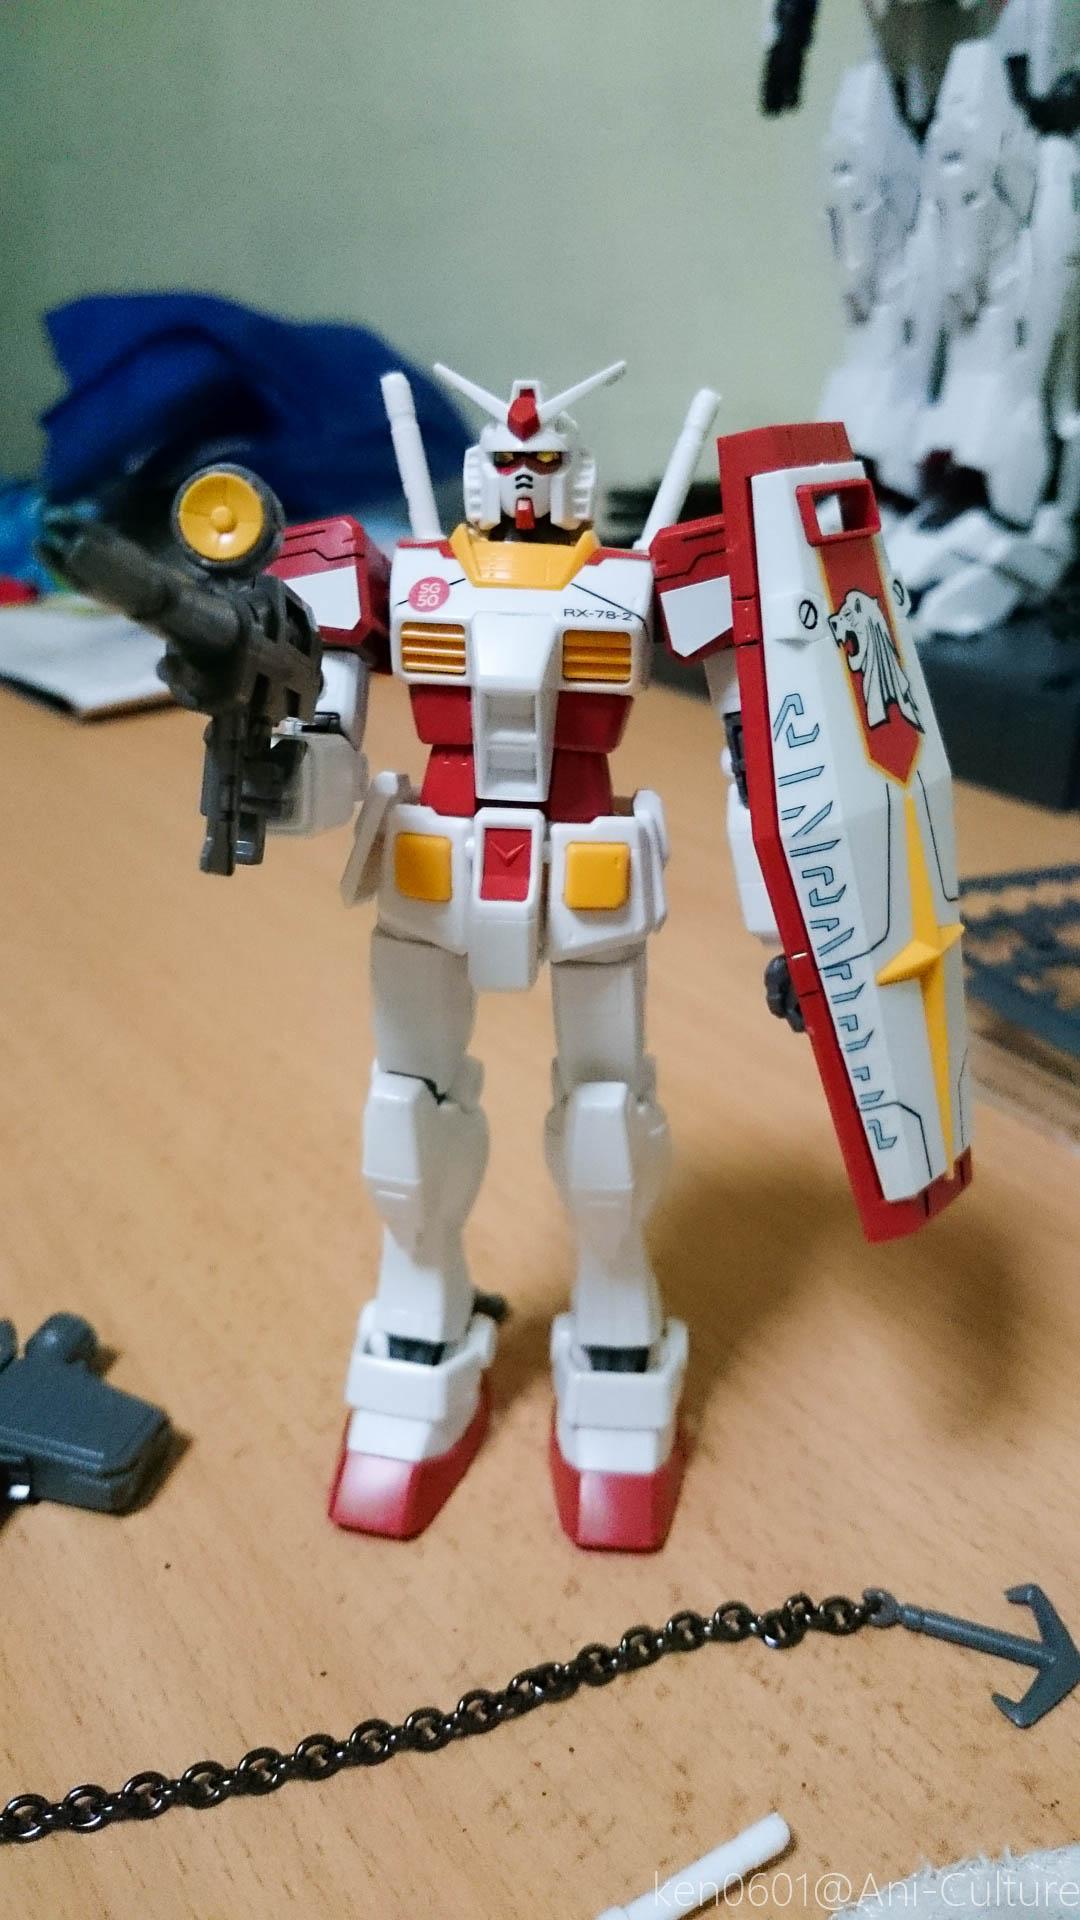 SG50 HG RX-78-2 Gundam